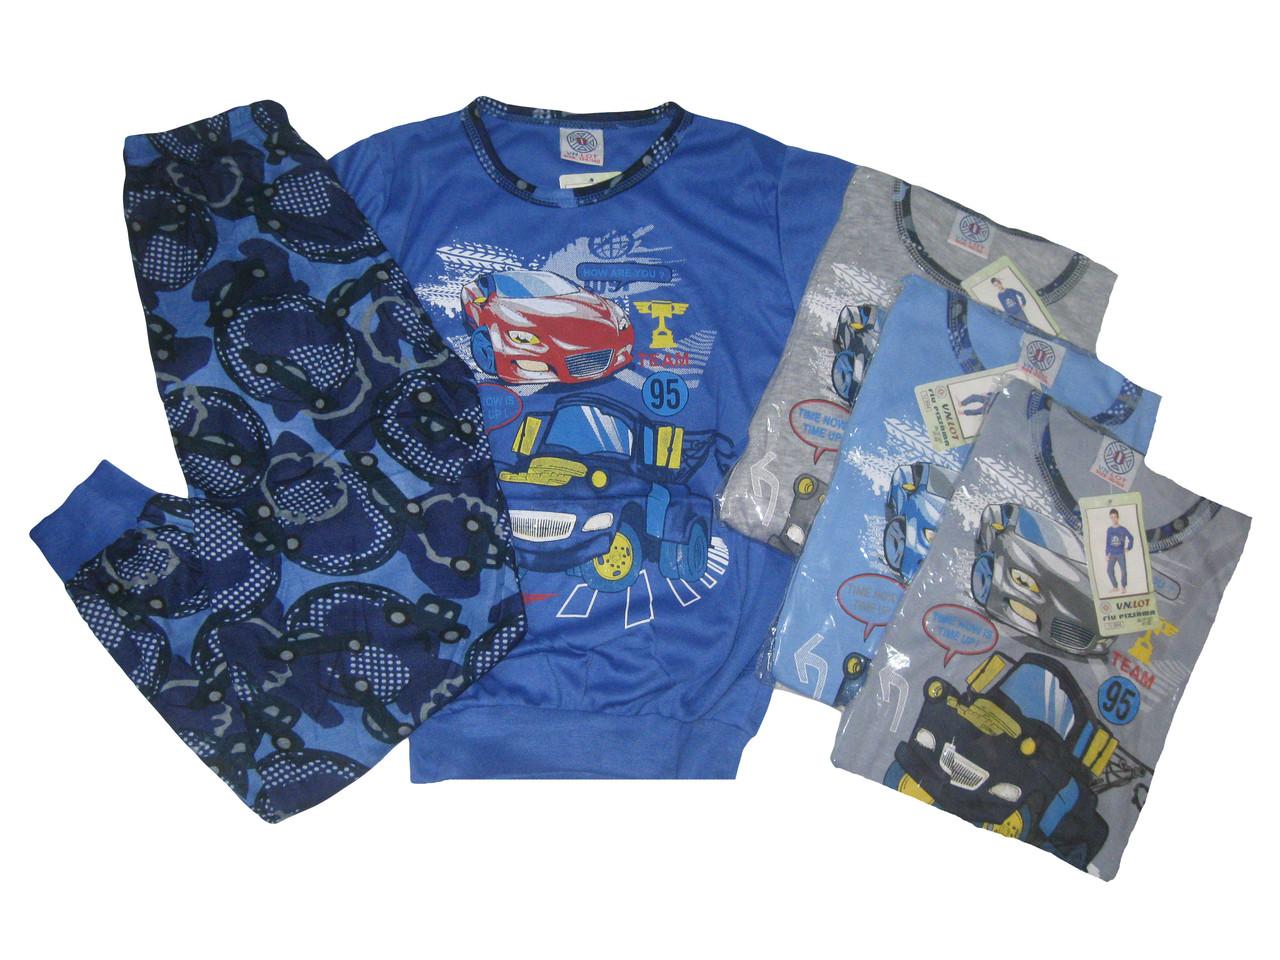 Пижама трикотажная для мальчиков, размеры 98/104-134/140,  арт. 1/894